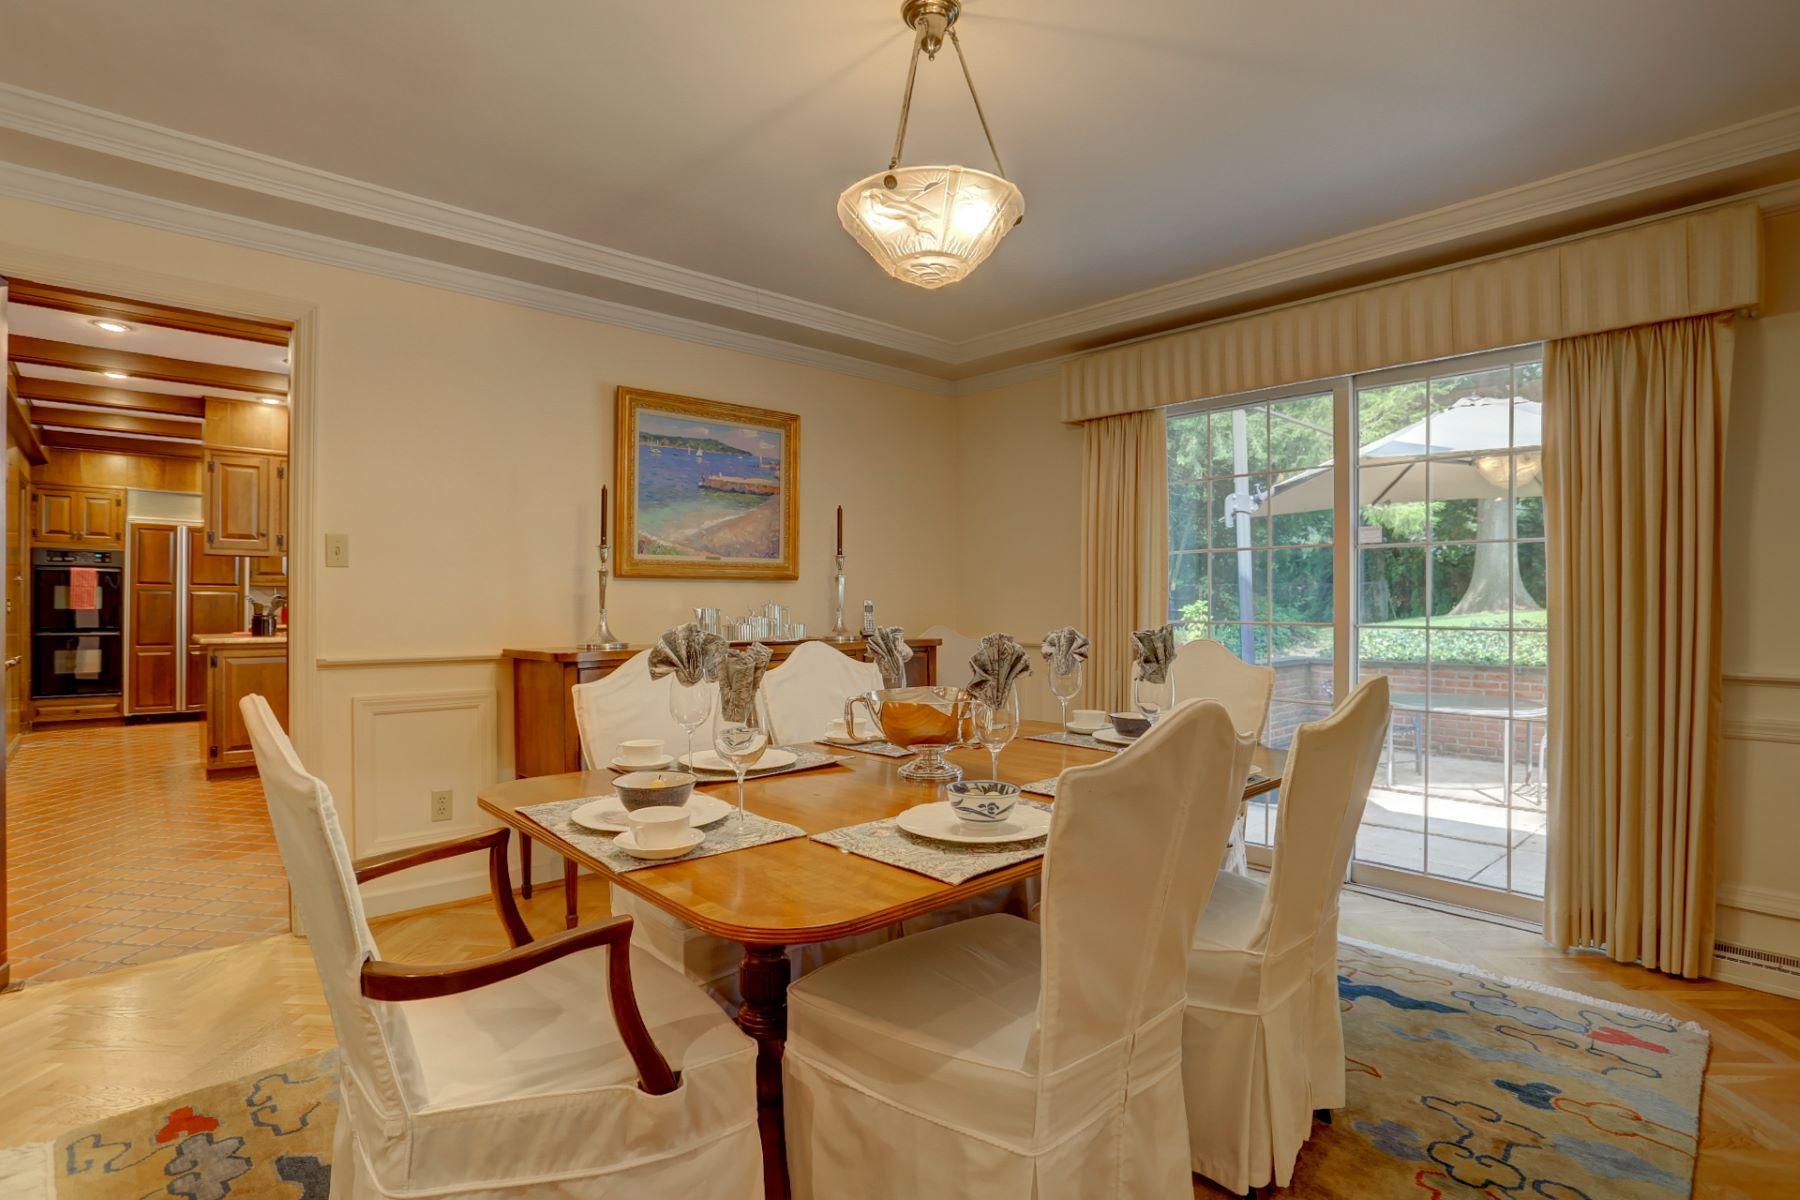 Additional photo for property listing at 605 Hamilton Road 605 Hamilton Road 兰开斯特, 宾夕法尼亚州 17603 美国